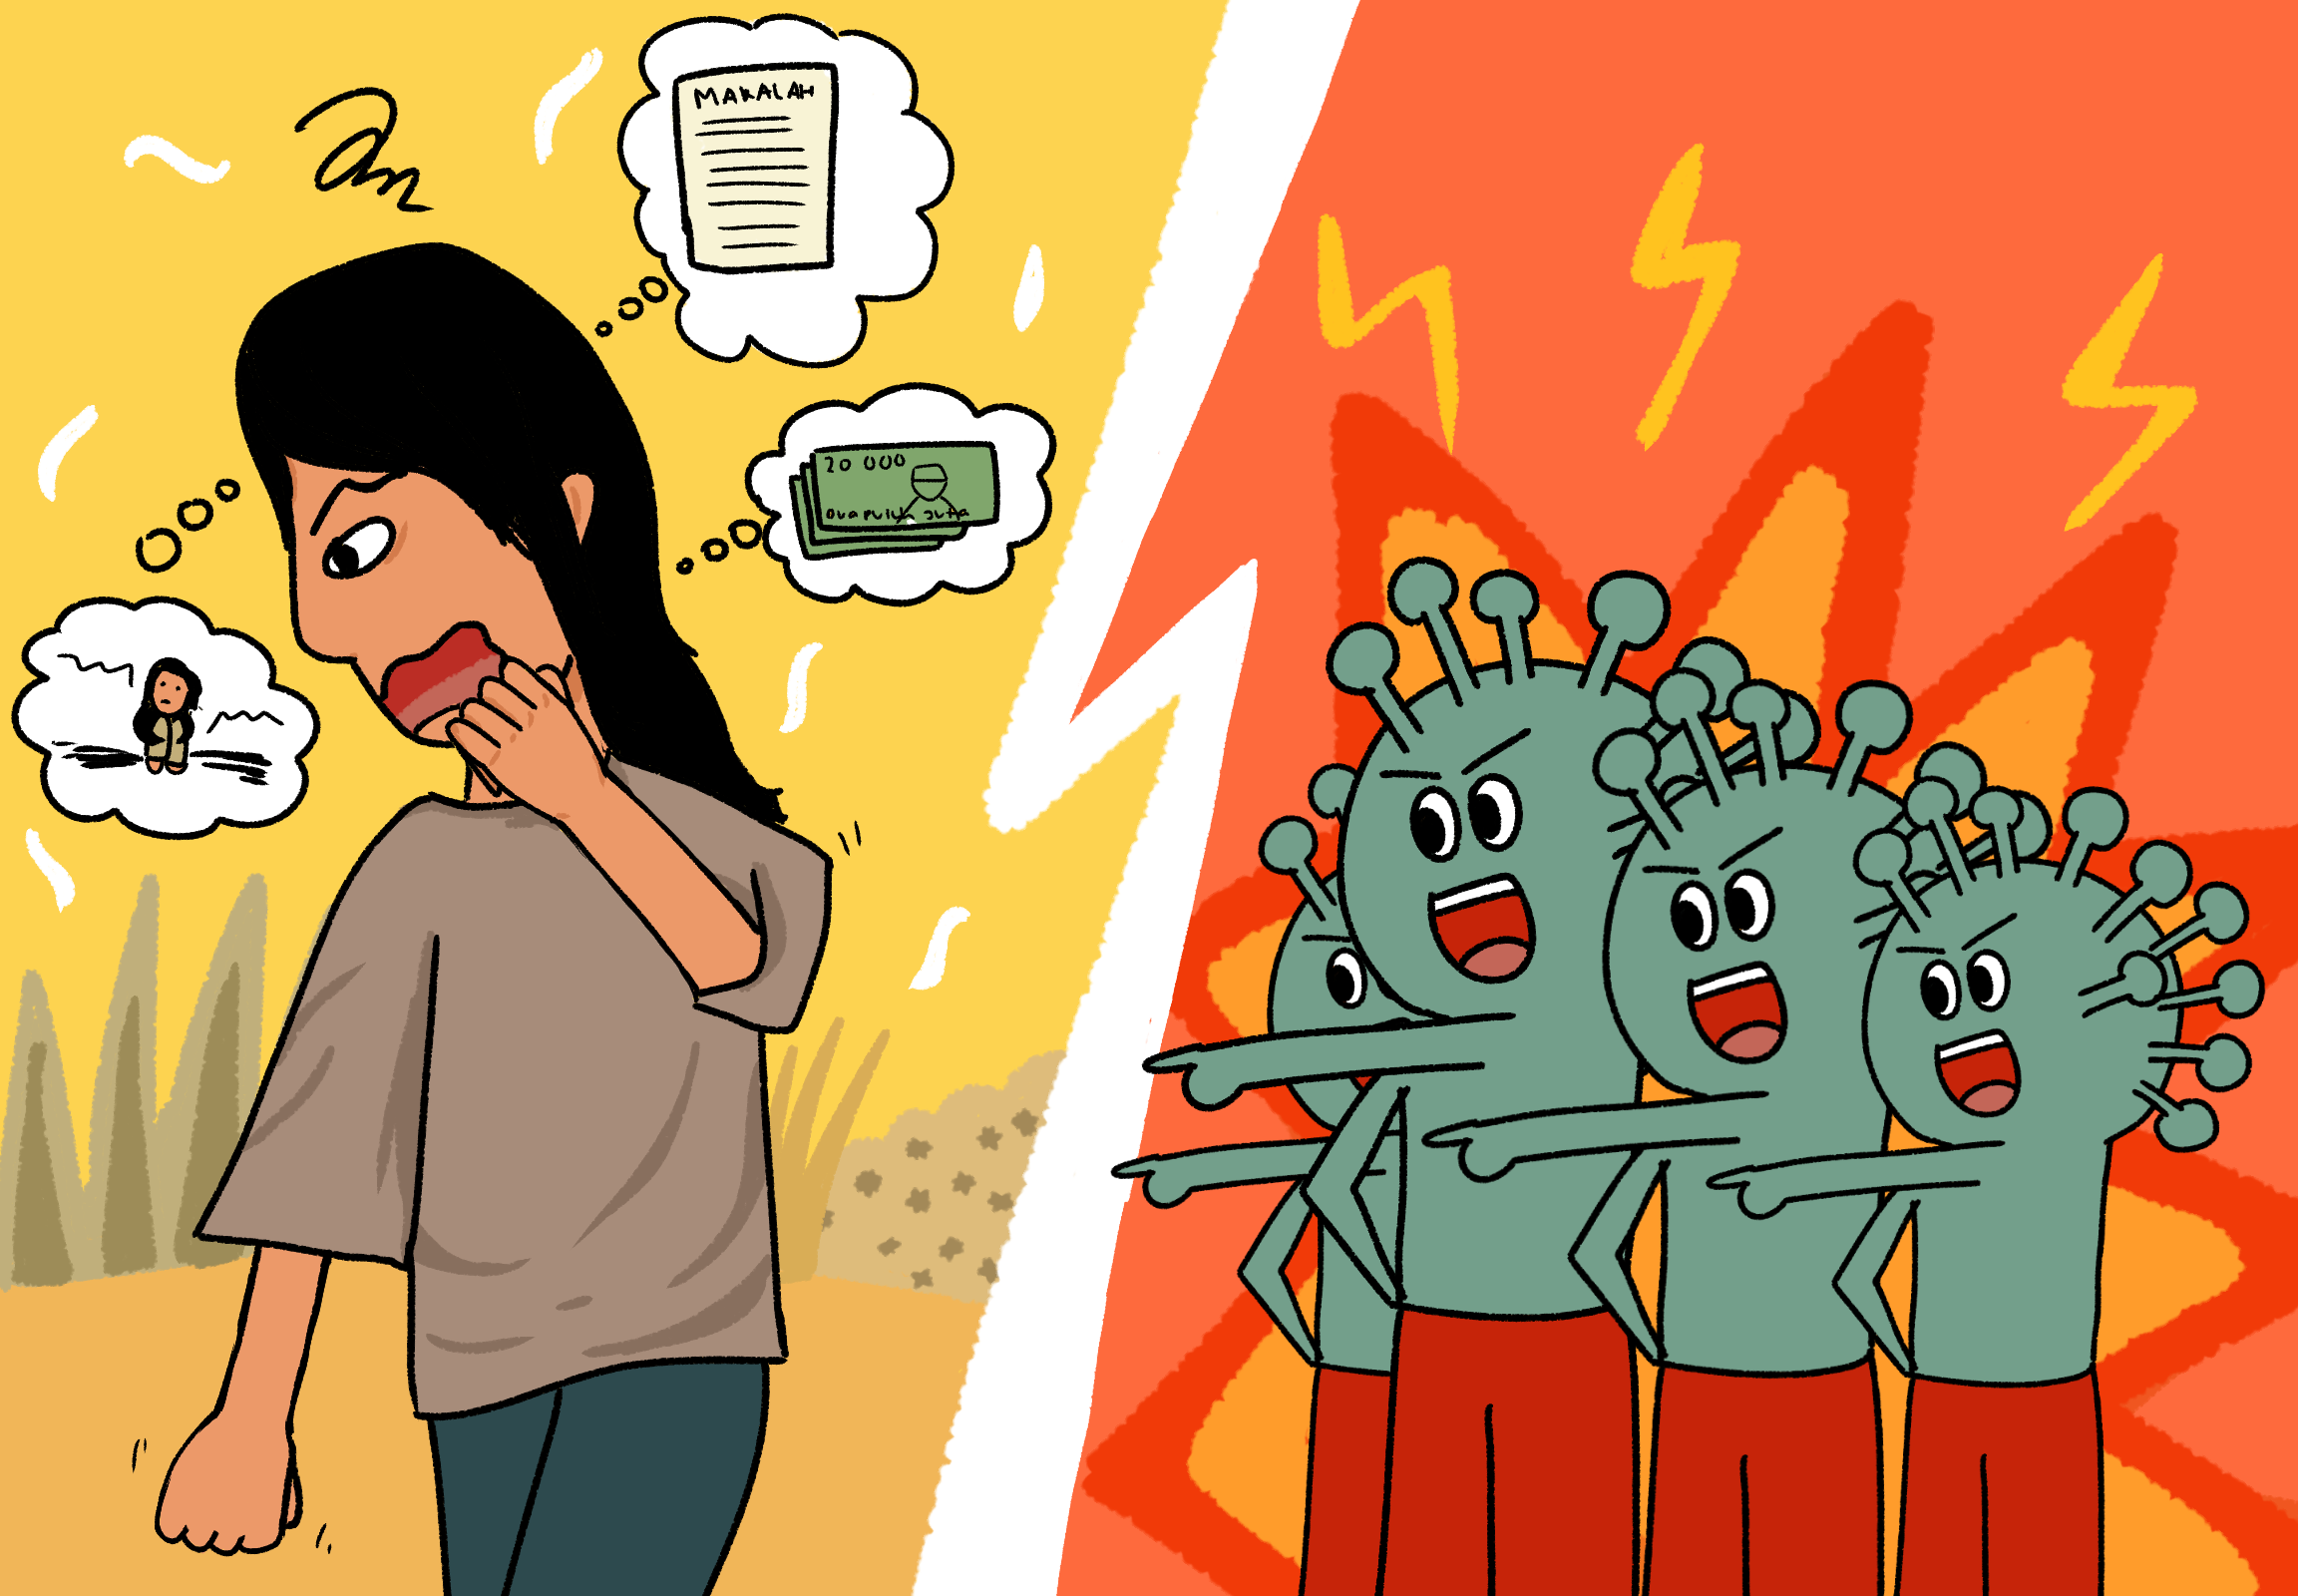 Merawat Kesehatan Mental Di Masa Pandemi Ala Stoikisme | Balairungpress